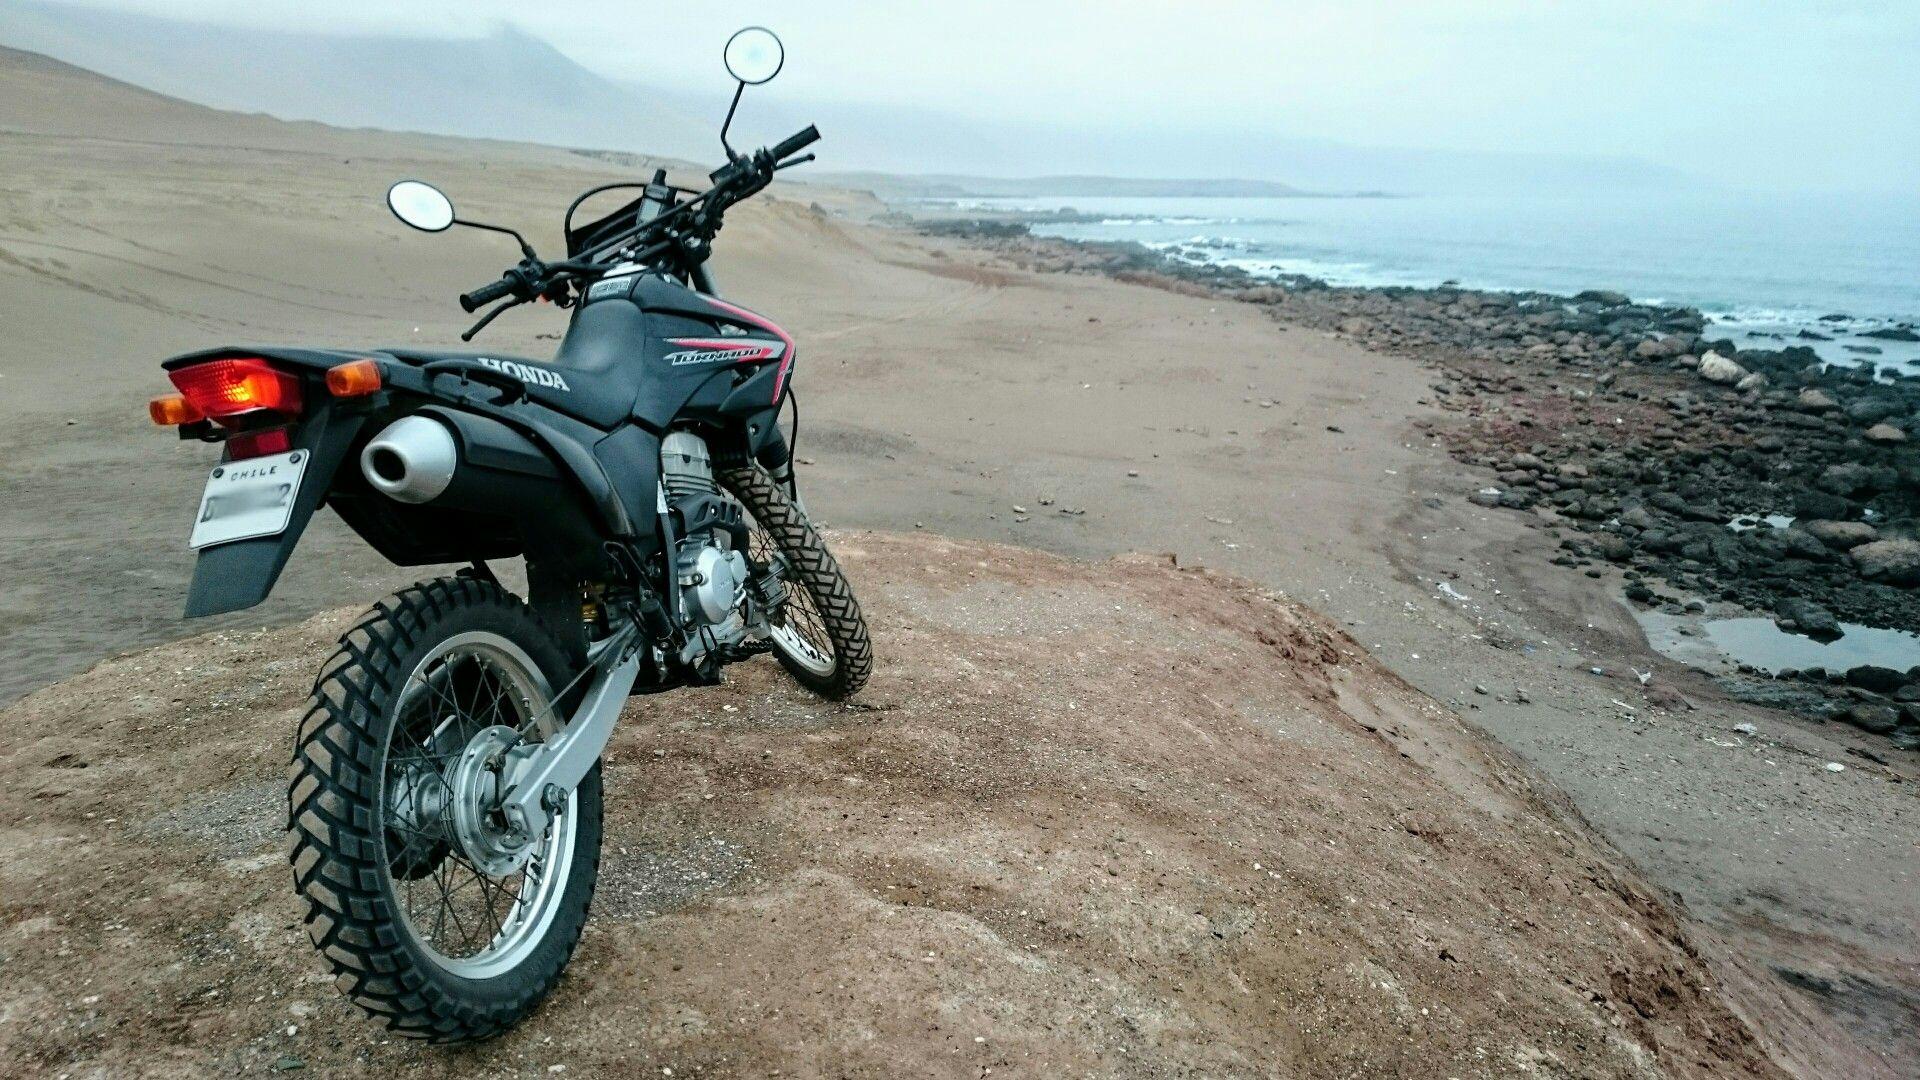 Honda Xr250 Tornado Moto Honda Motorbike Vehicles